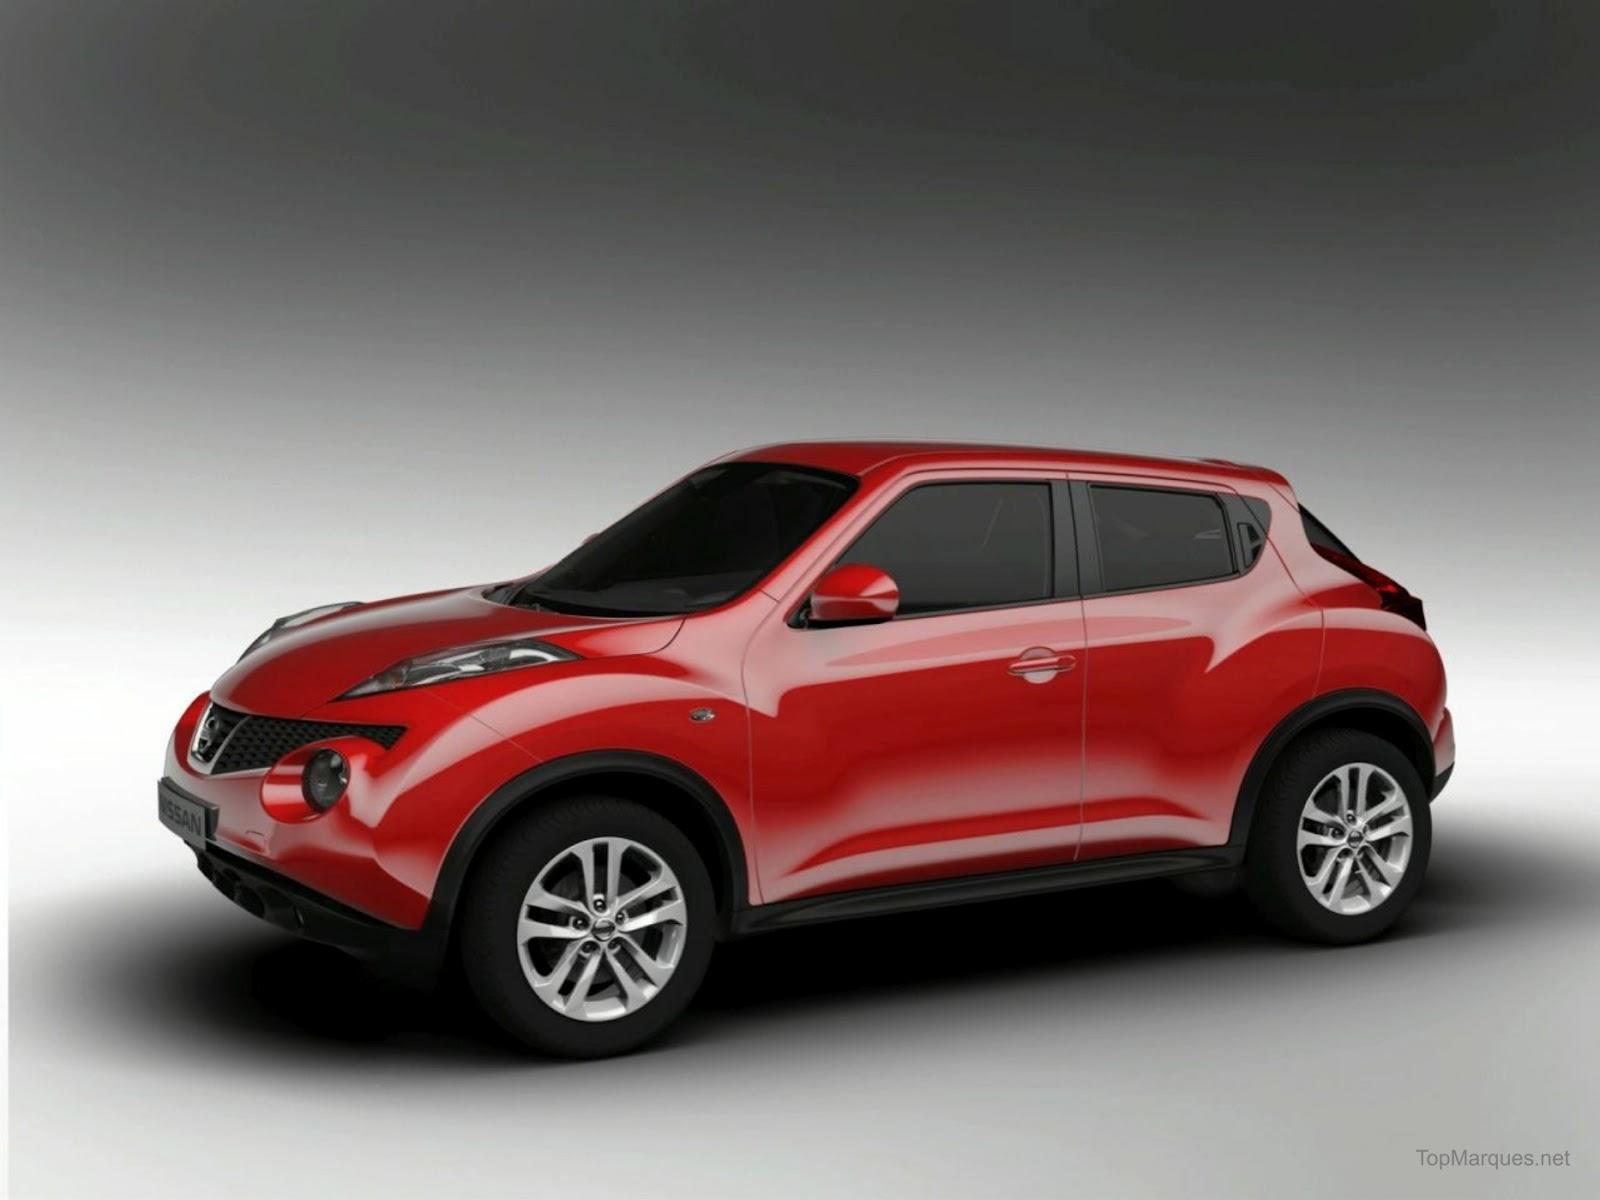 Crossover Nissan Juke >> Nissan Juke Sport Car HD Wallpapers Part.1 | Best Cars HD Wallpapers